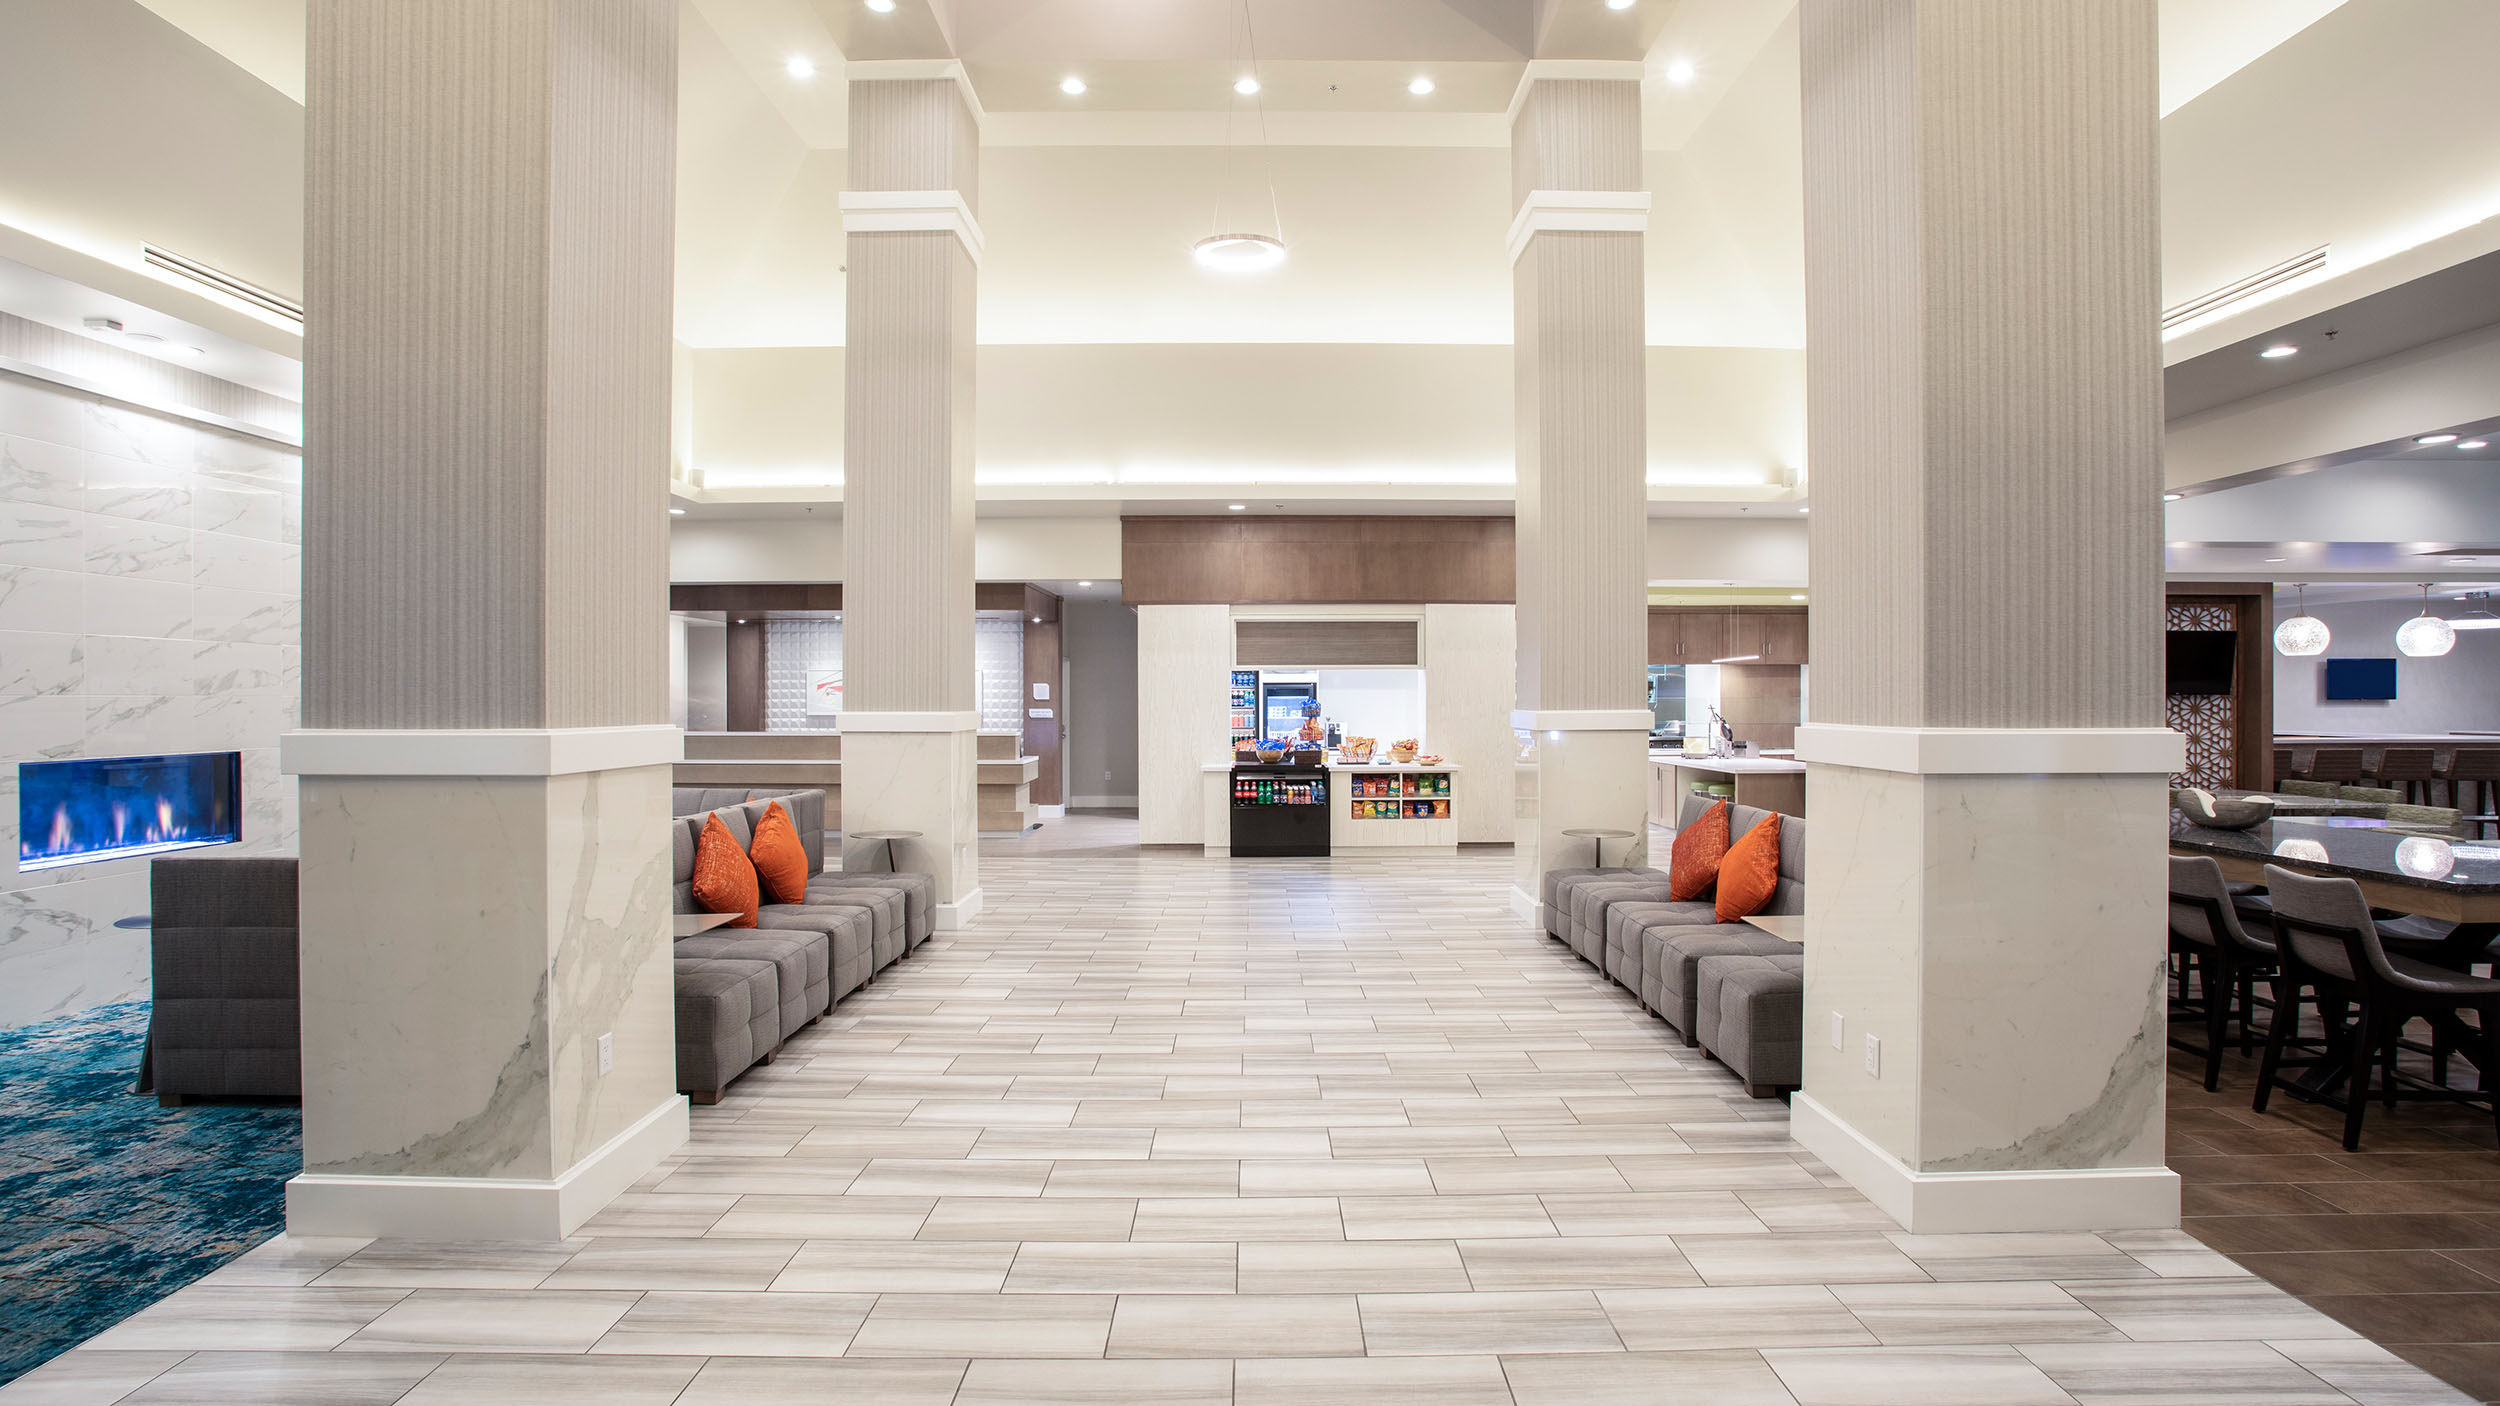 LASLGGI Hilton Garden Inn Las Vegas Lobby Entry 2500.jpg